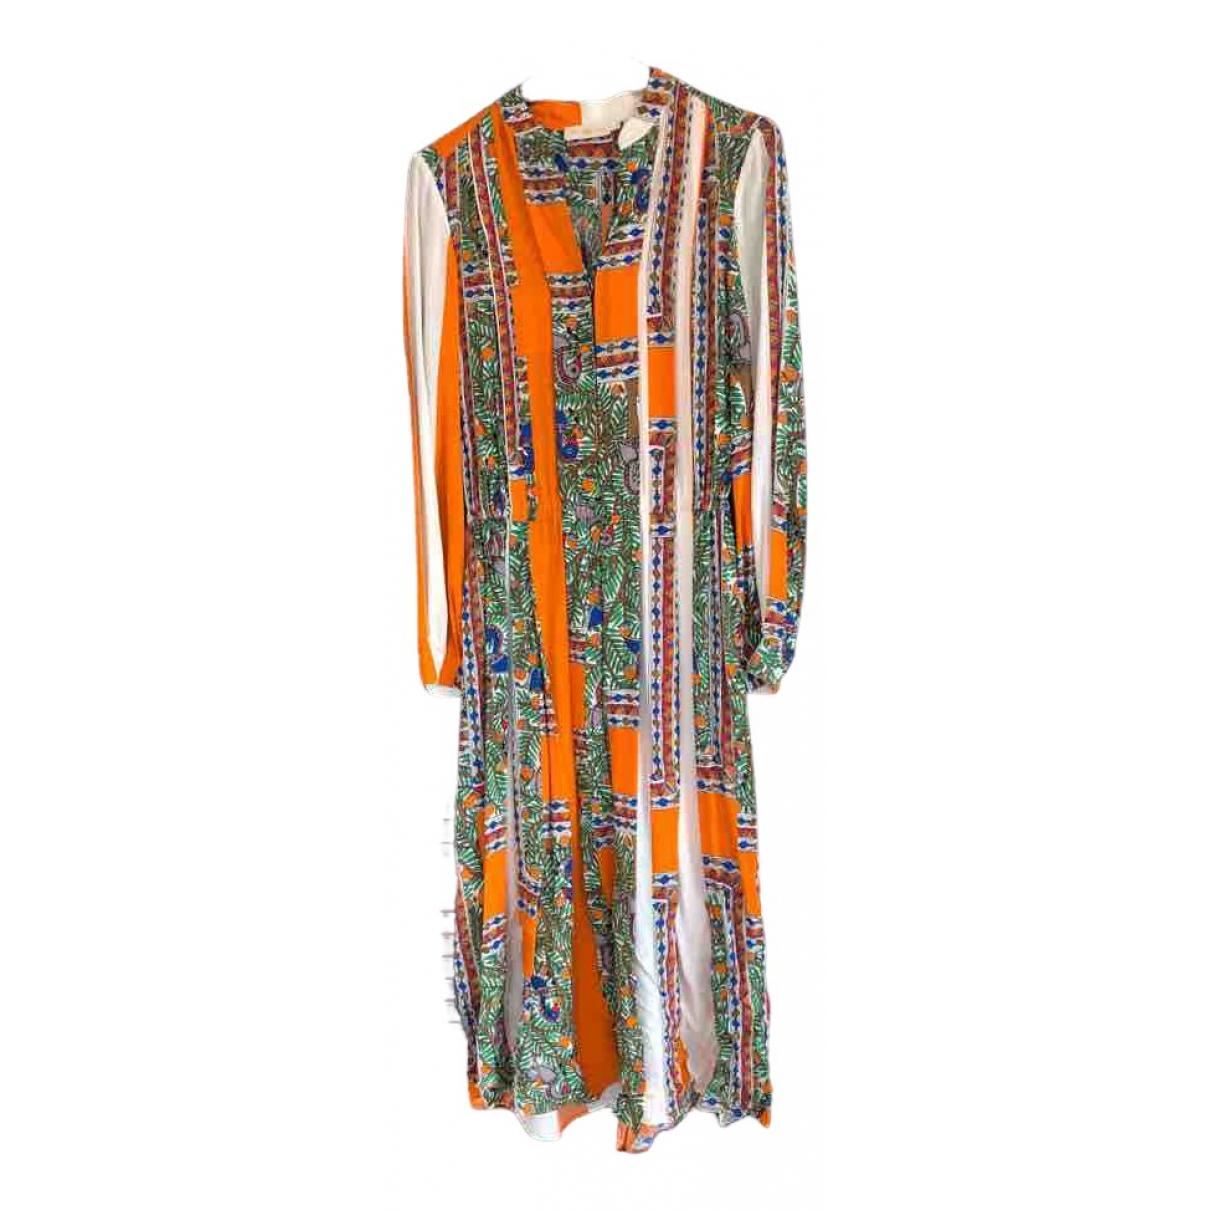 Tory Burch \N Orange dress for Women 6 UK